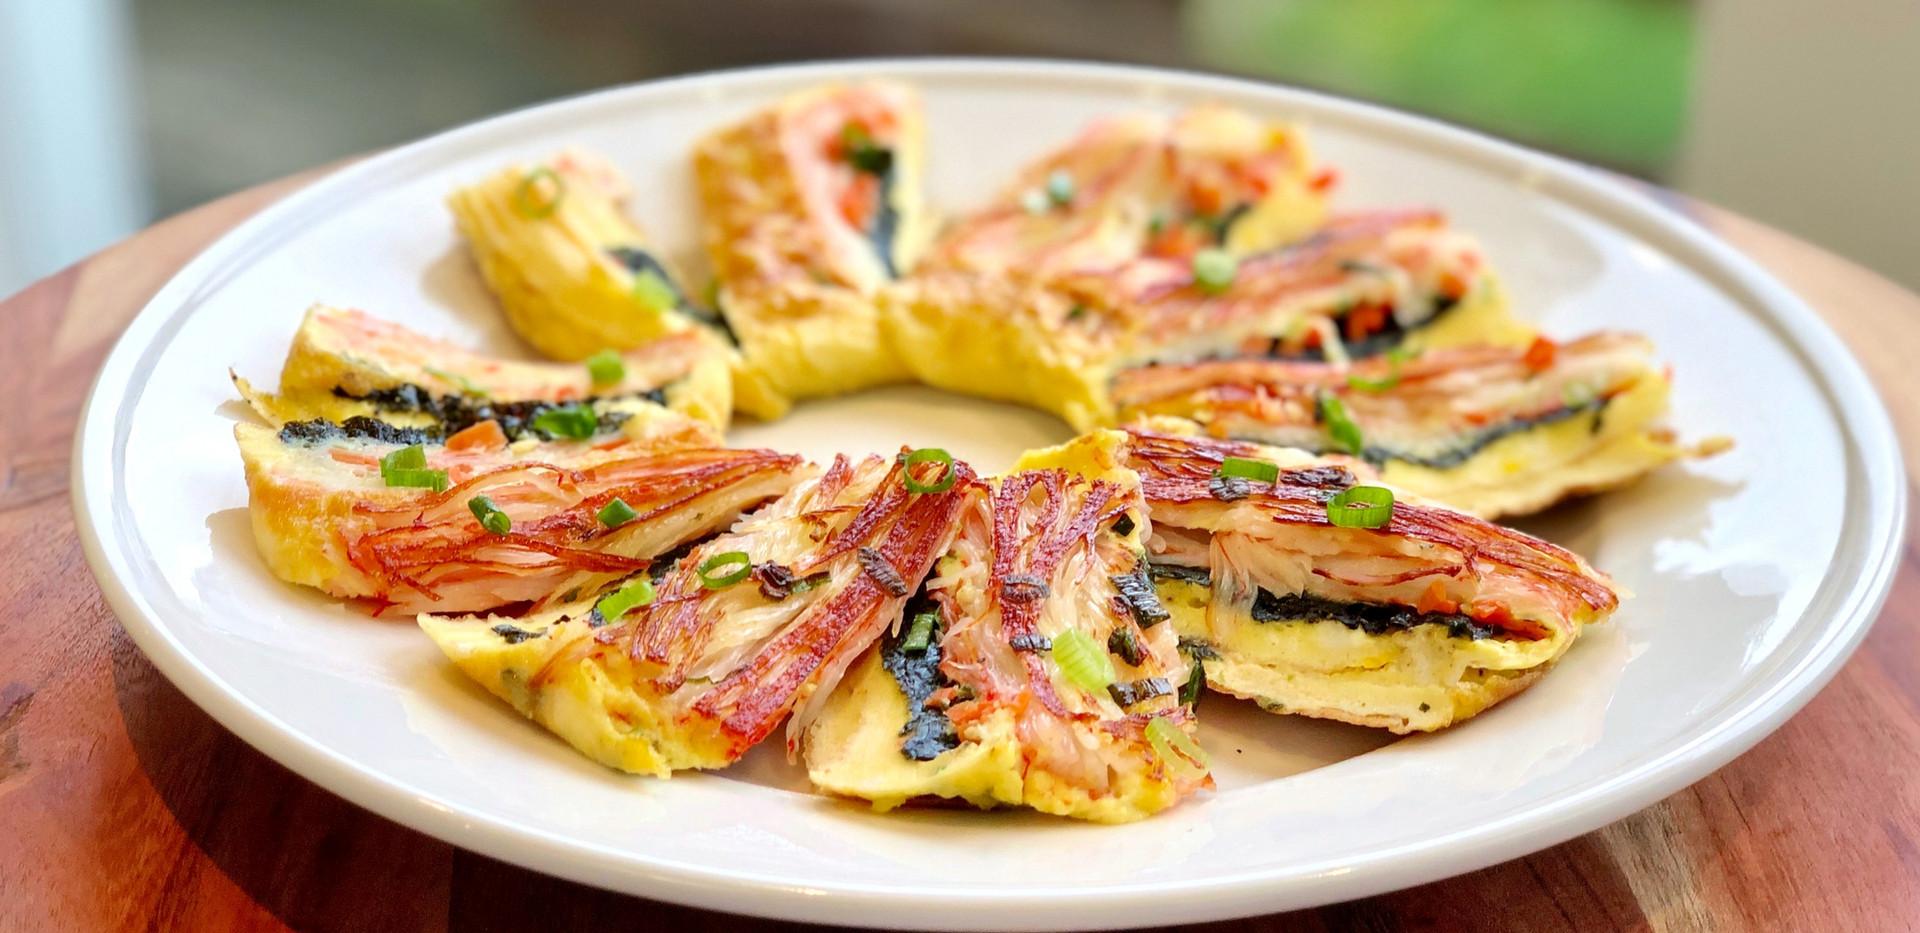 Korean Egg Roll Omelette w/ Crab Meat 🦀Recipe & Mukbang: Gyeran Mari 계란말이 (Banchan/Side Dish)